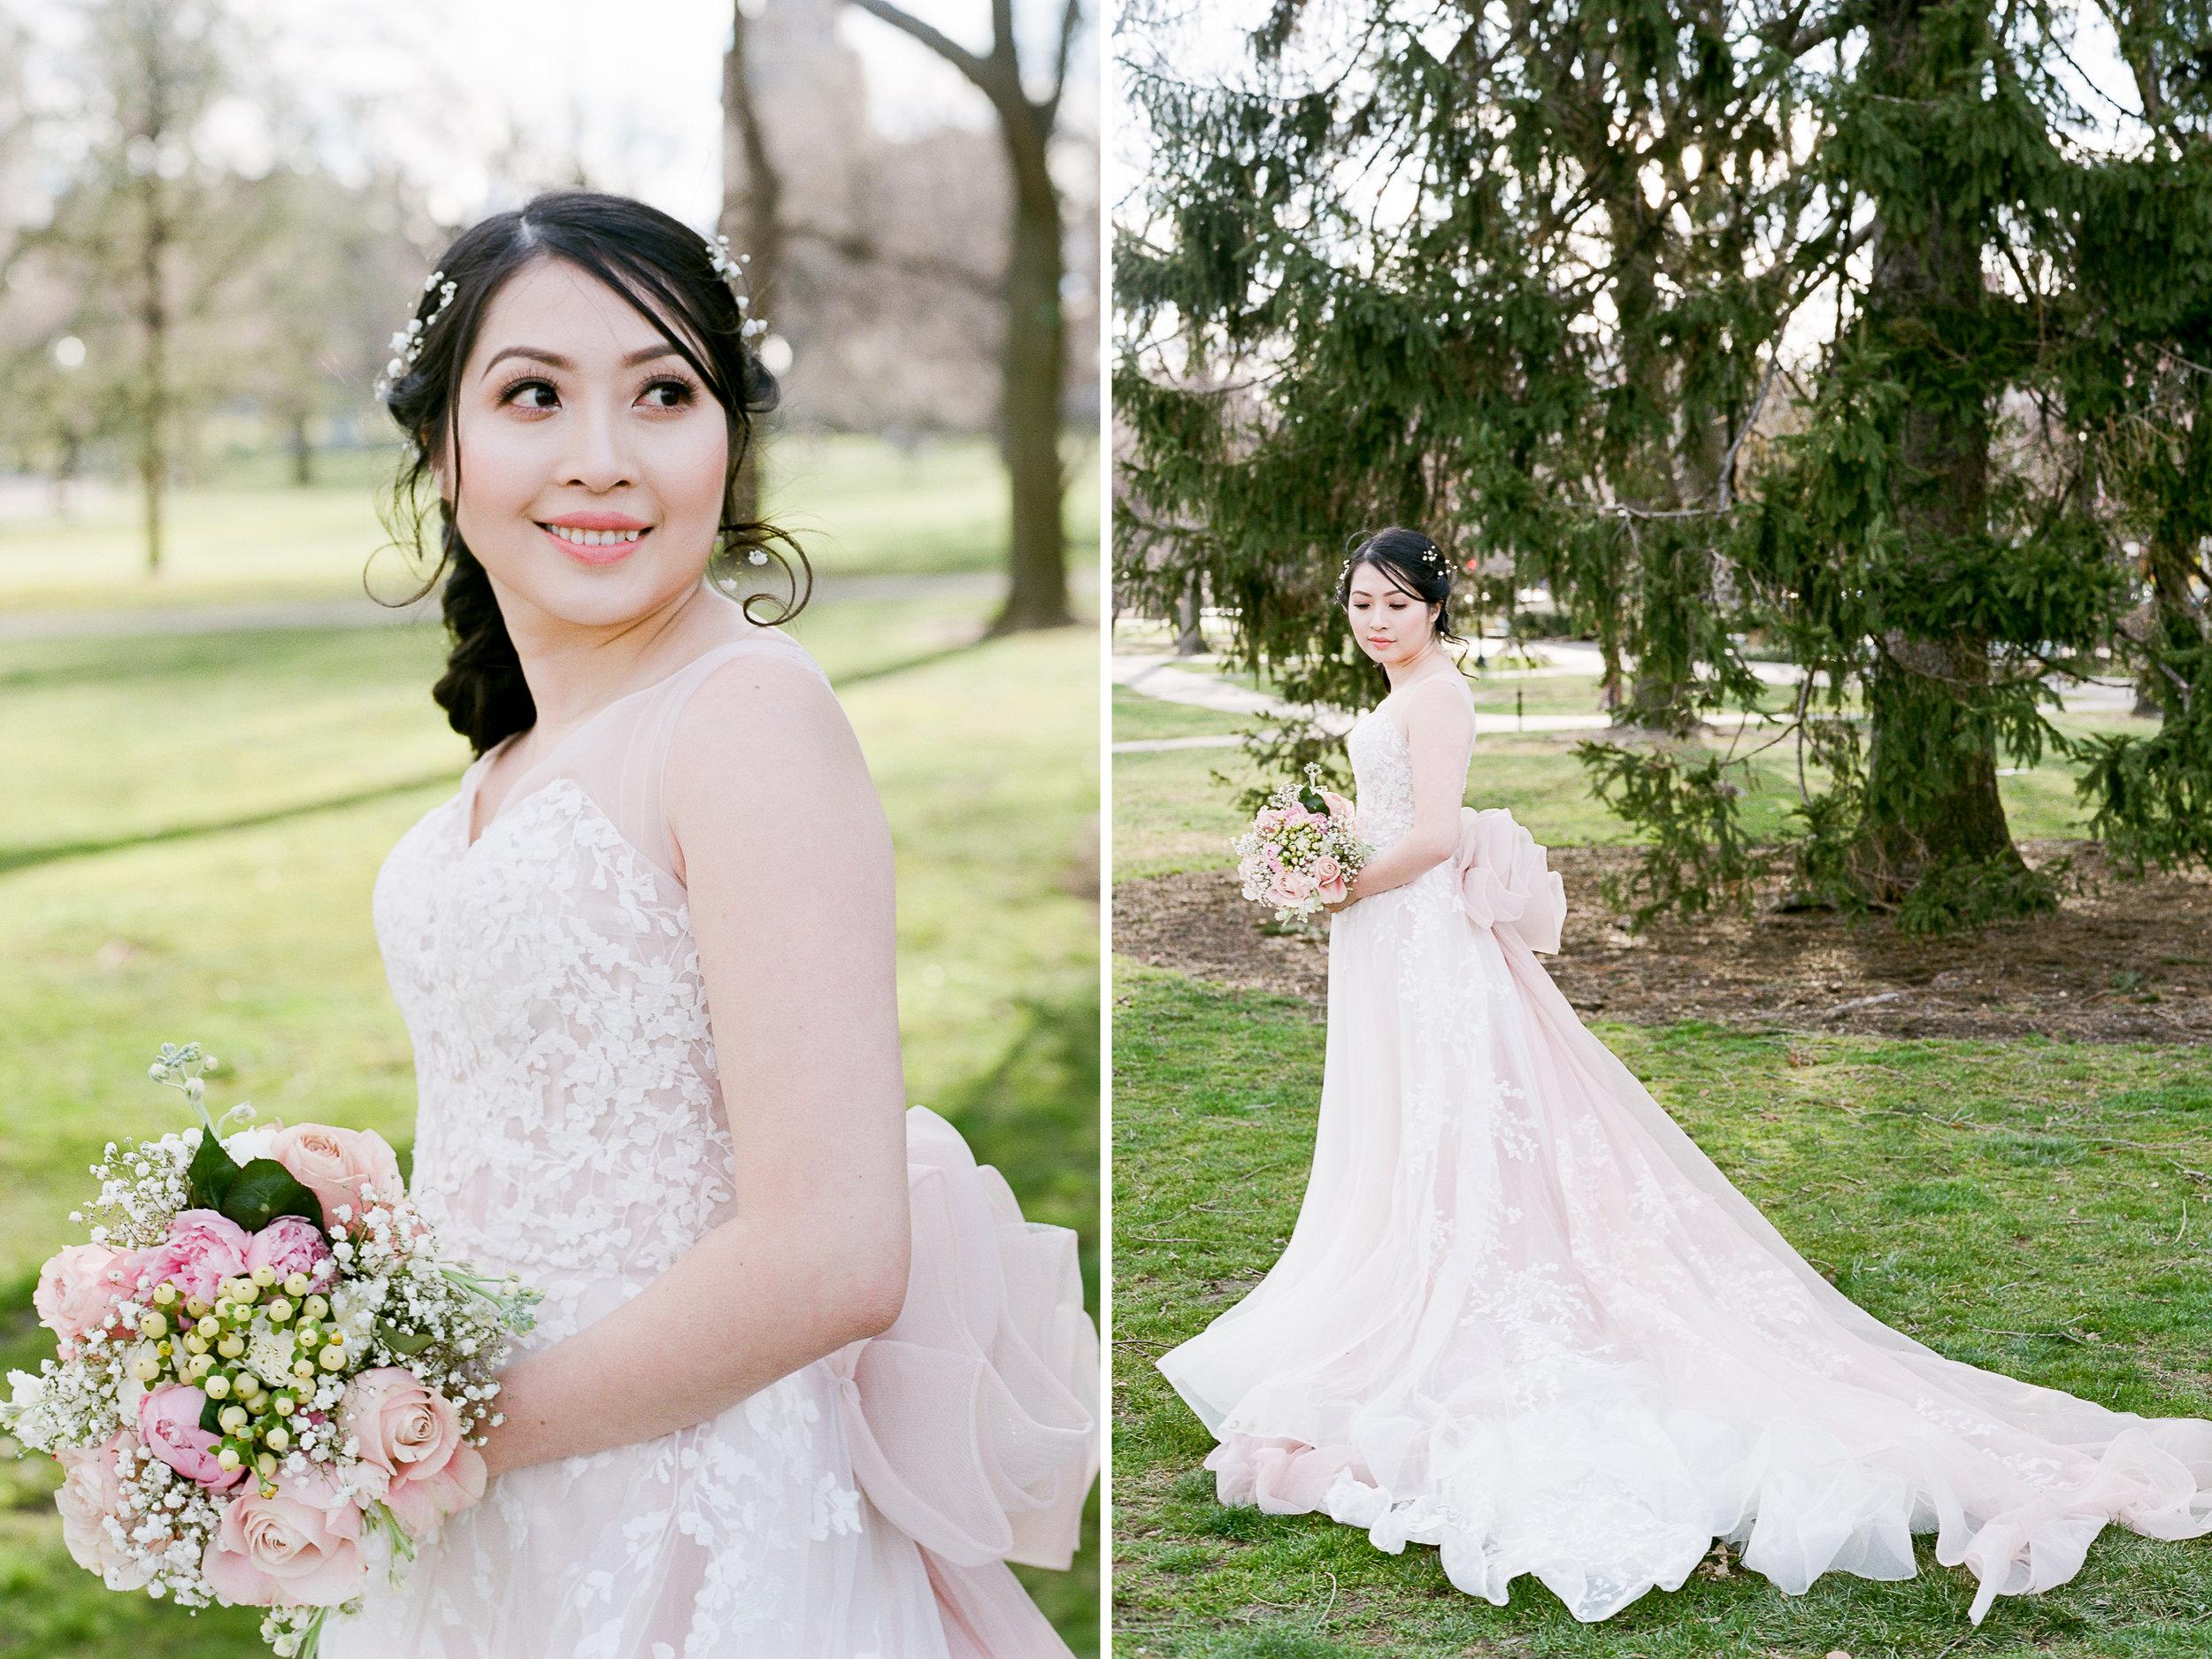 Timeless Wedding Photography in Massachusetts